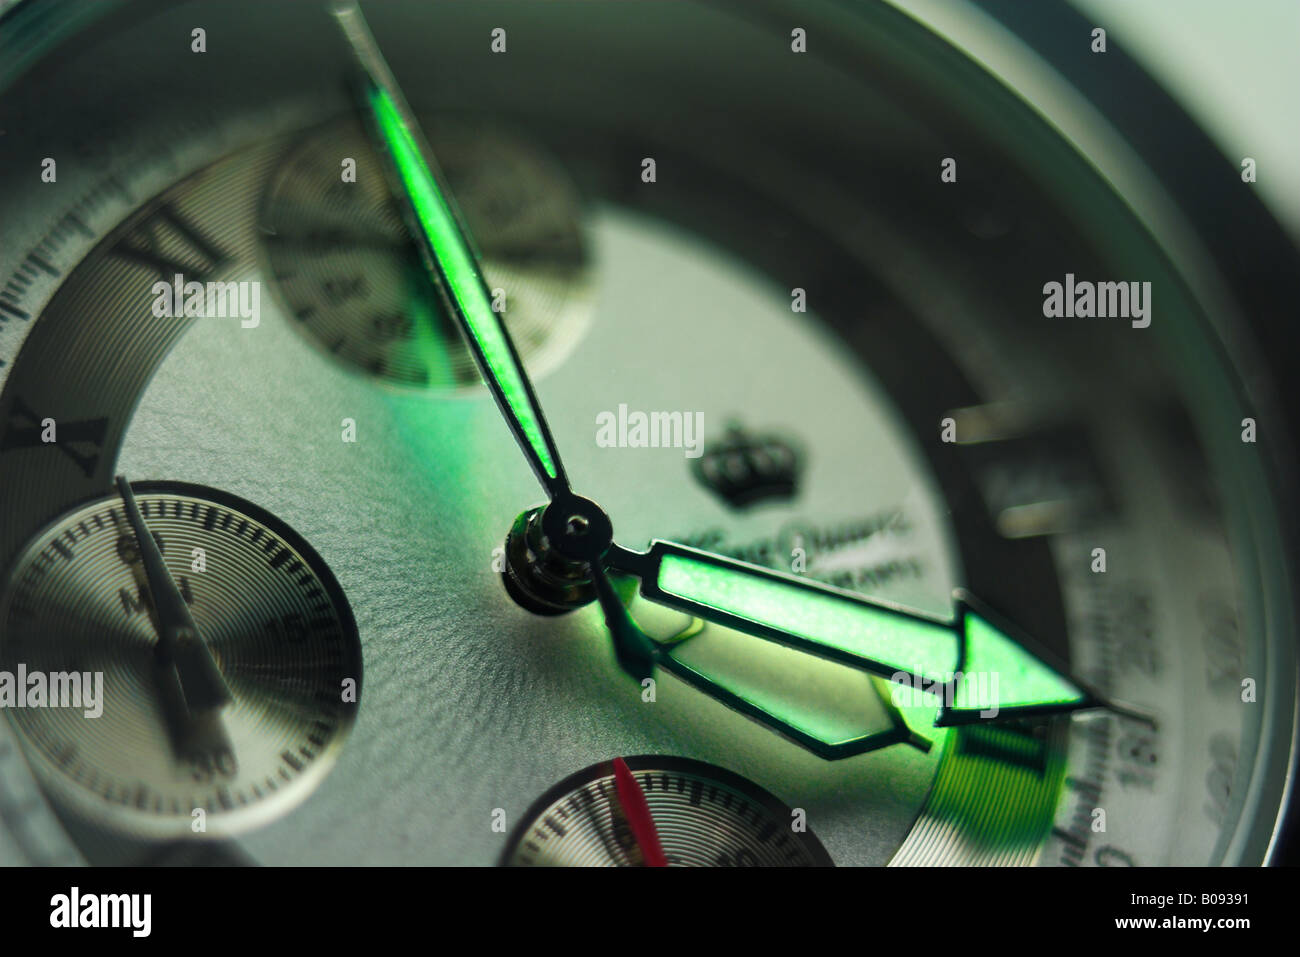 Wristwatch displaying 4:20:00 Stock Photo